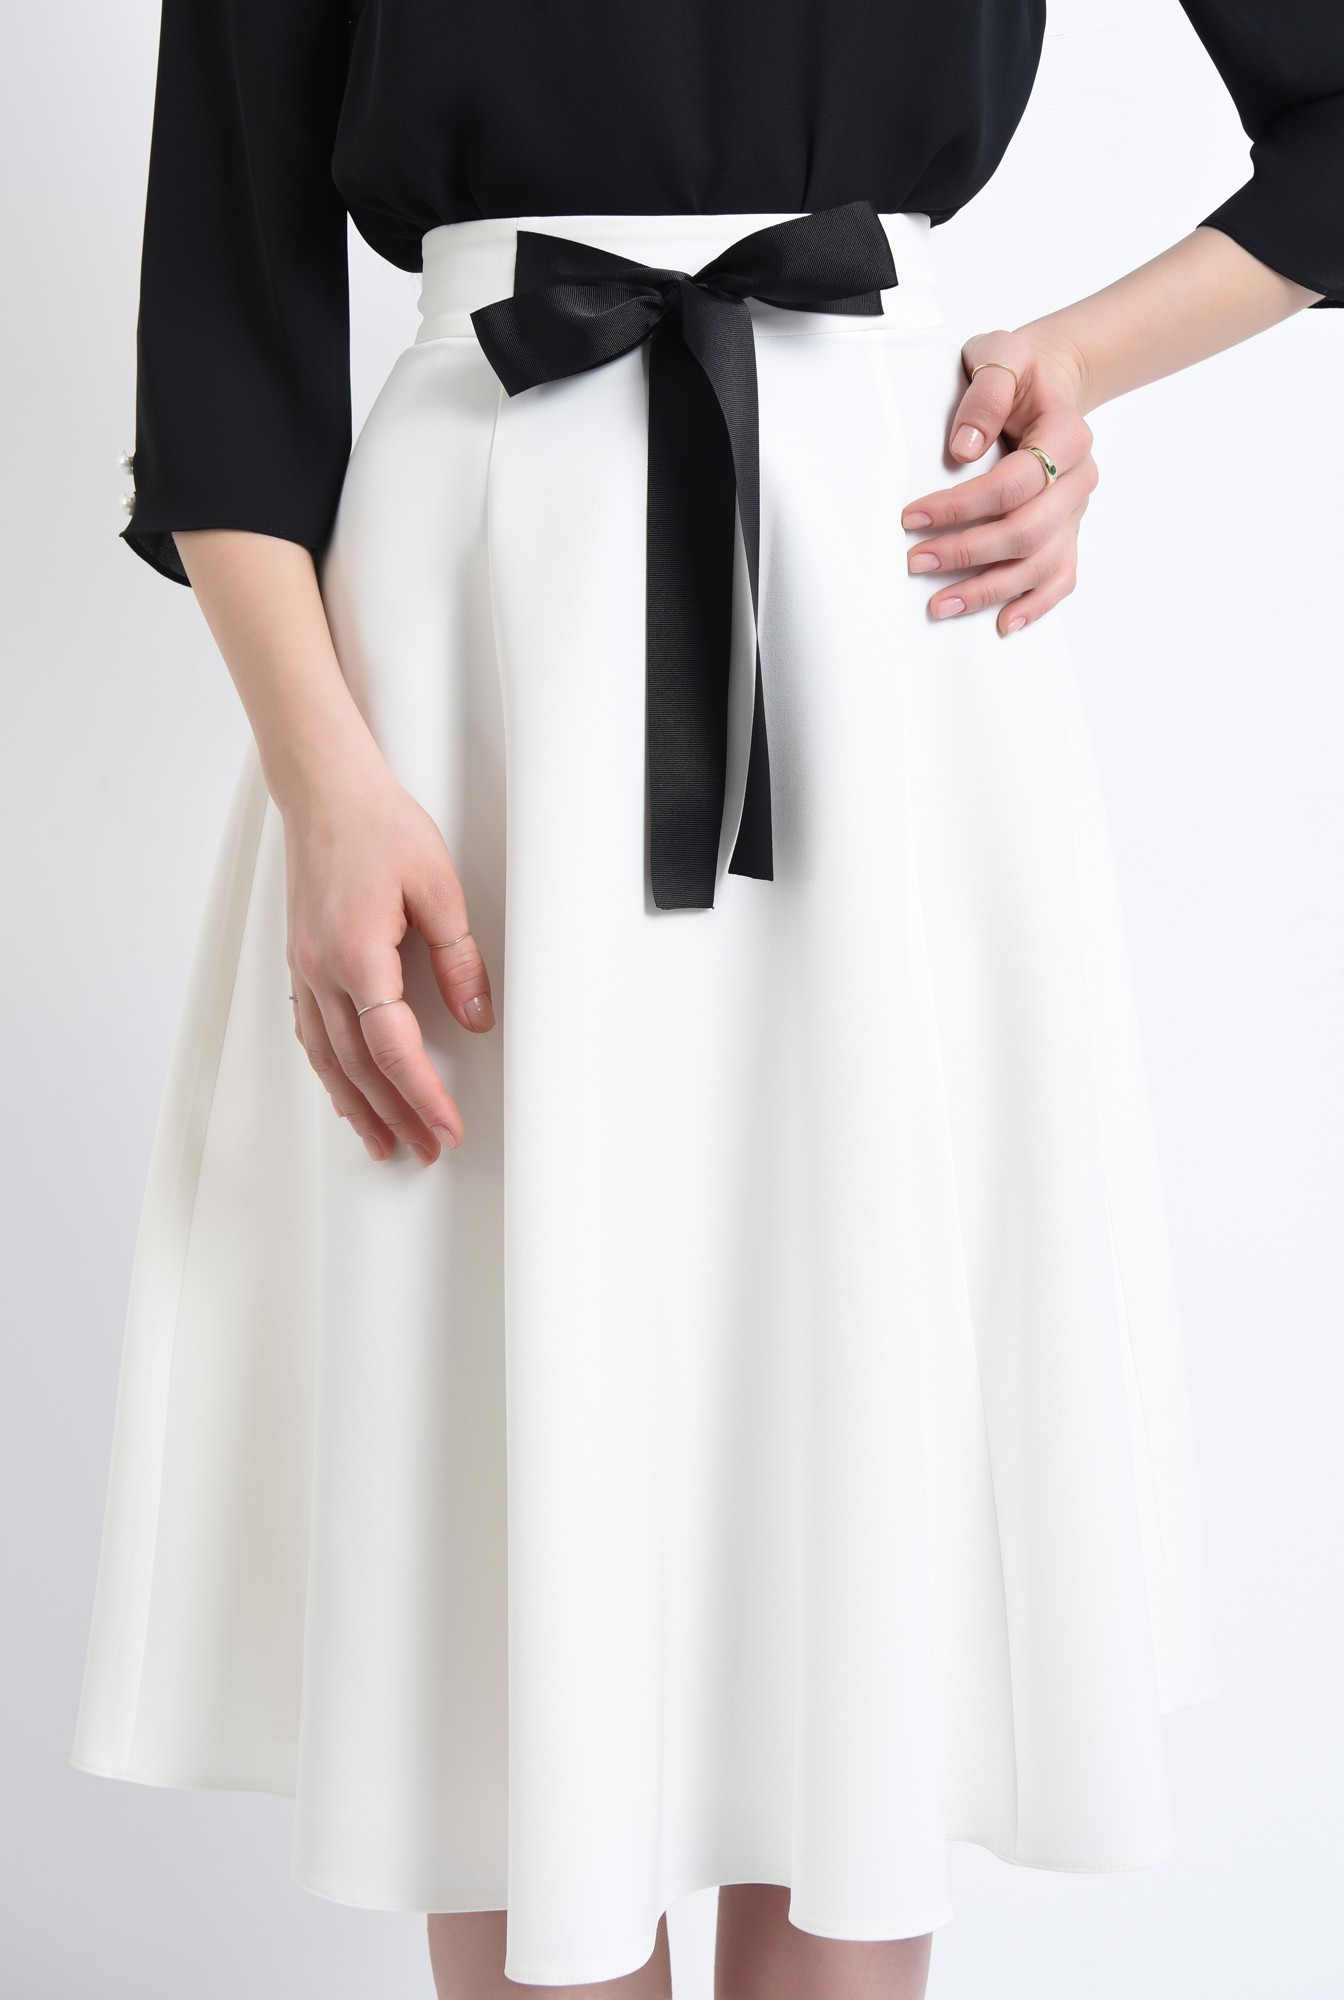 2 - Fusta eleganta, funda, contrast alb-negru